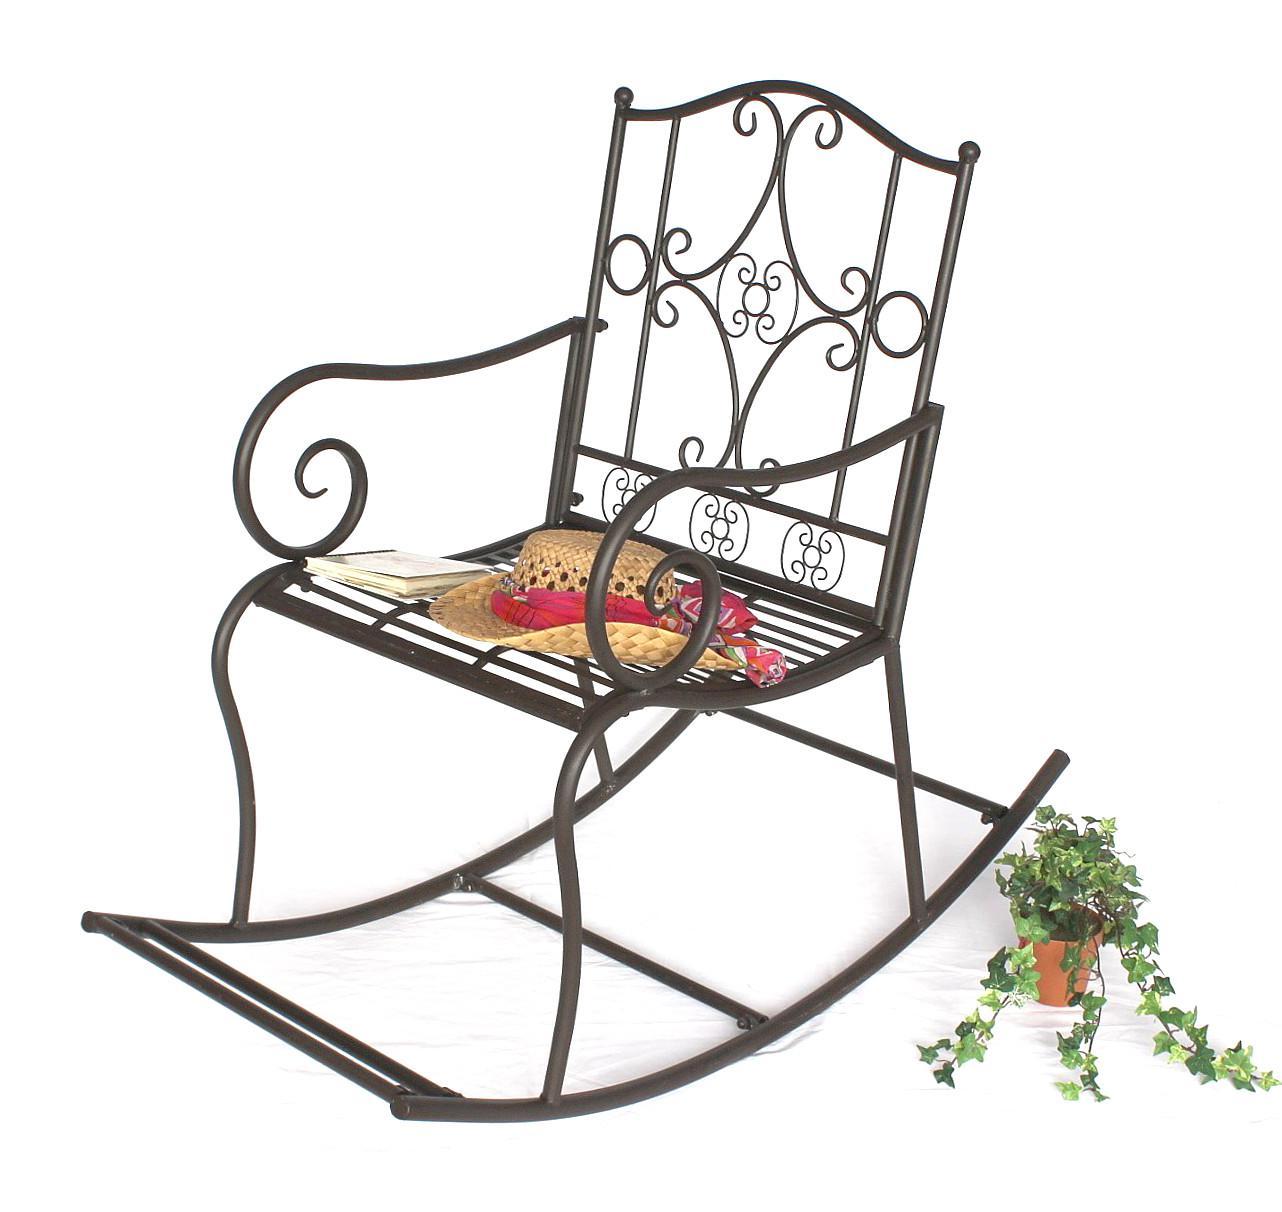 Free Dandibo Garten Gartenstuhl Metall Stuhl Schaukel Dy Braun Eisen Antik  With Metallstuhl